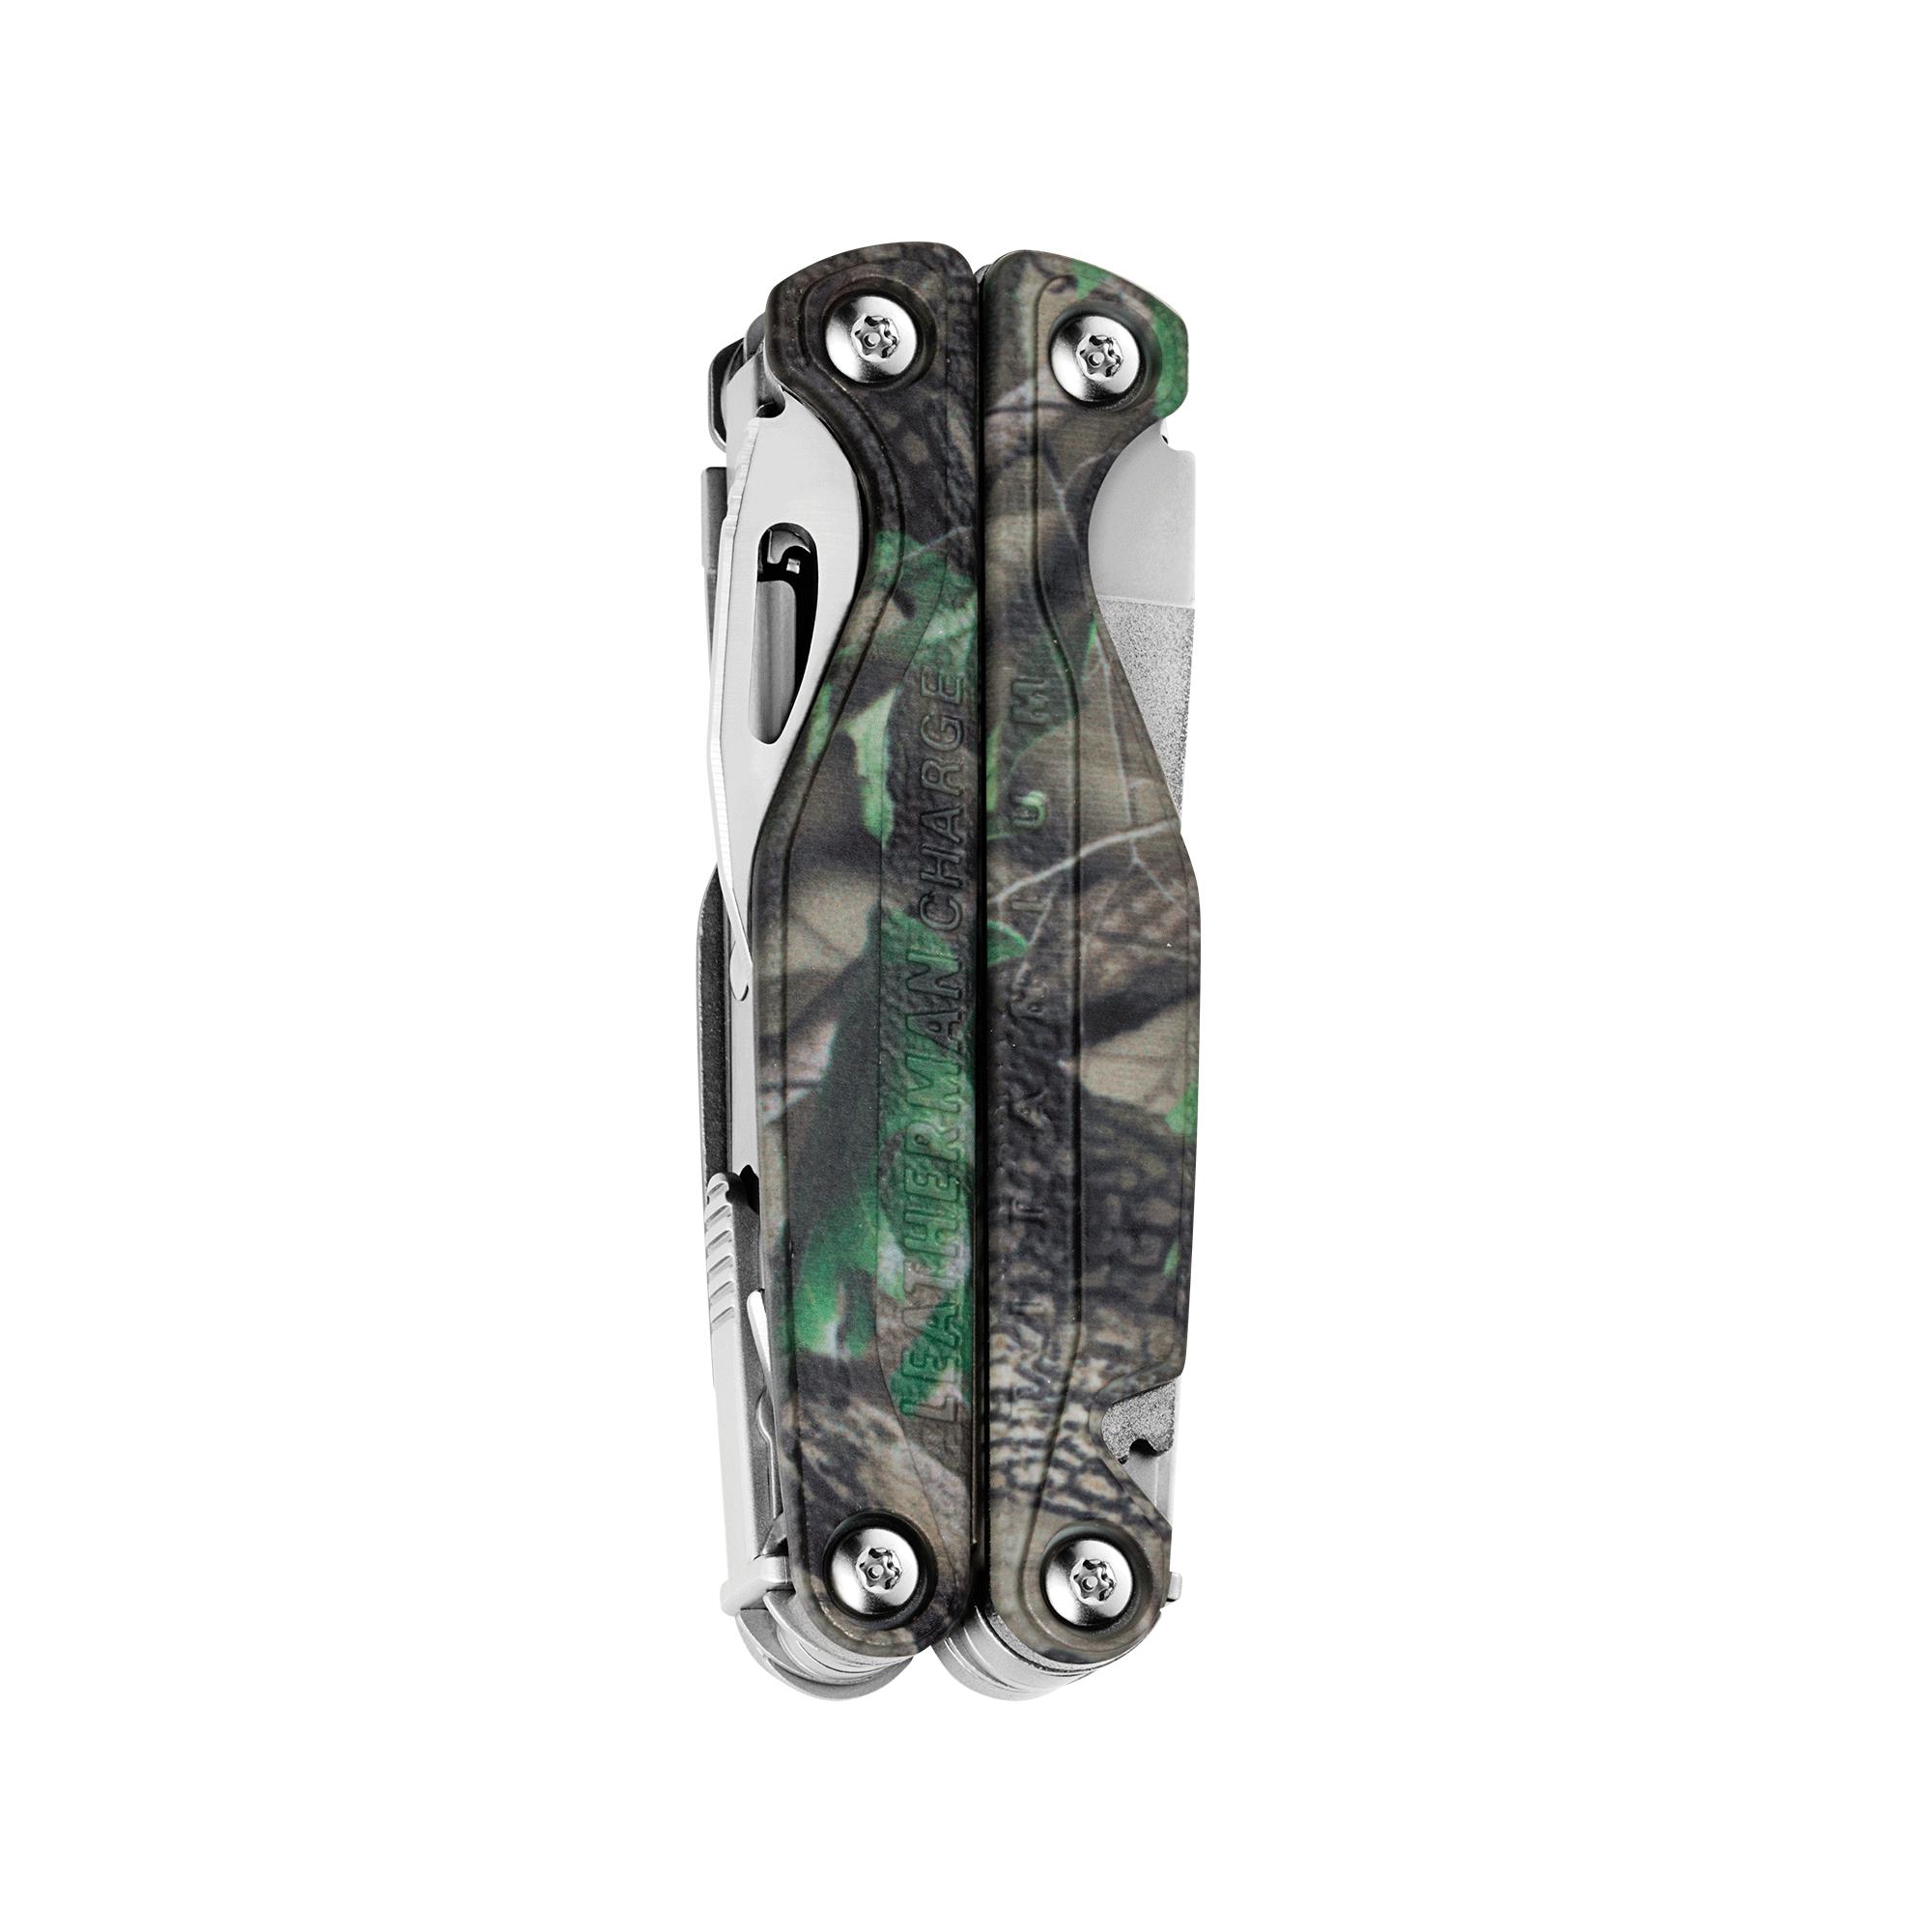 Leatherman Charge TTi multi-tool, closed view, Realtree camo print, 18 tools